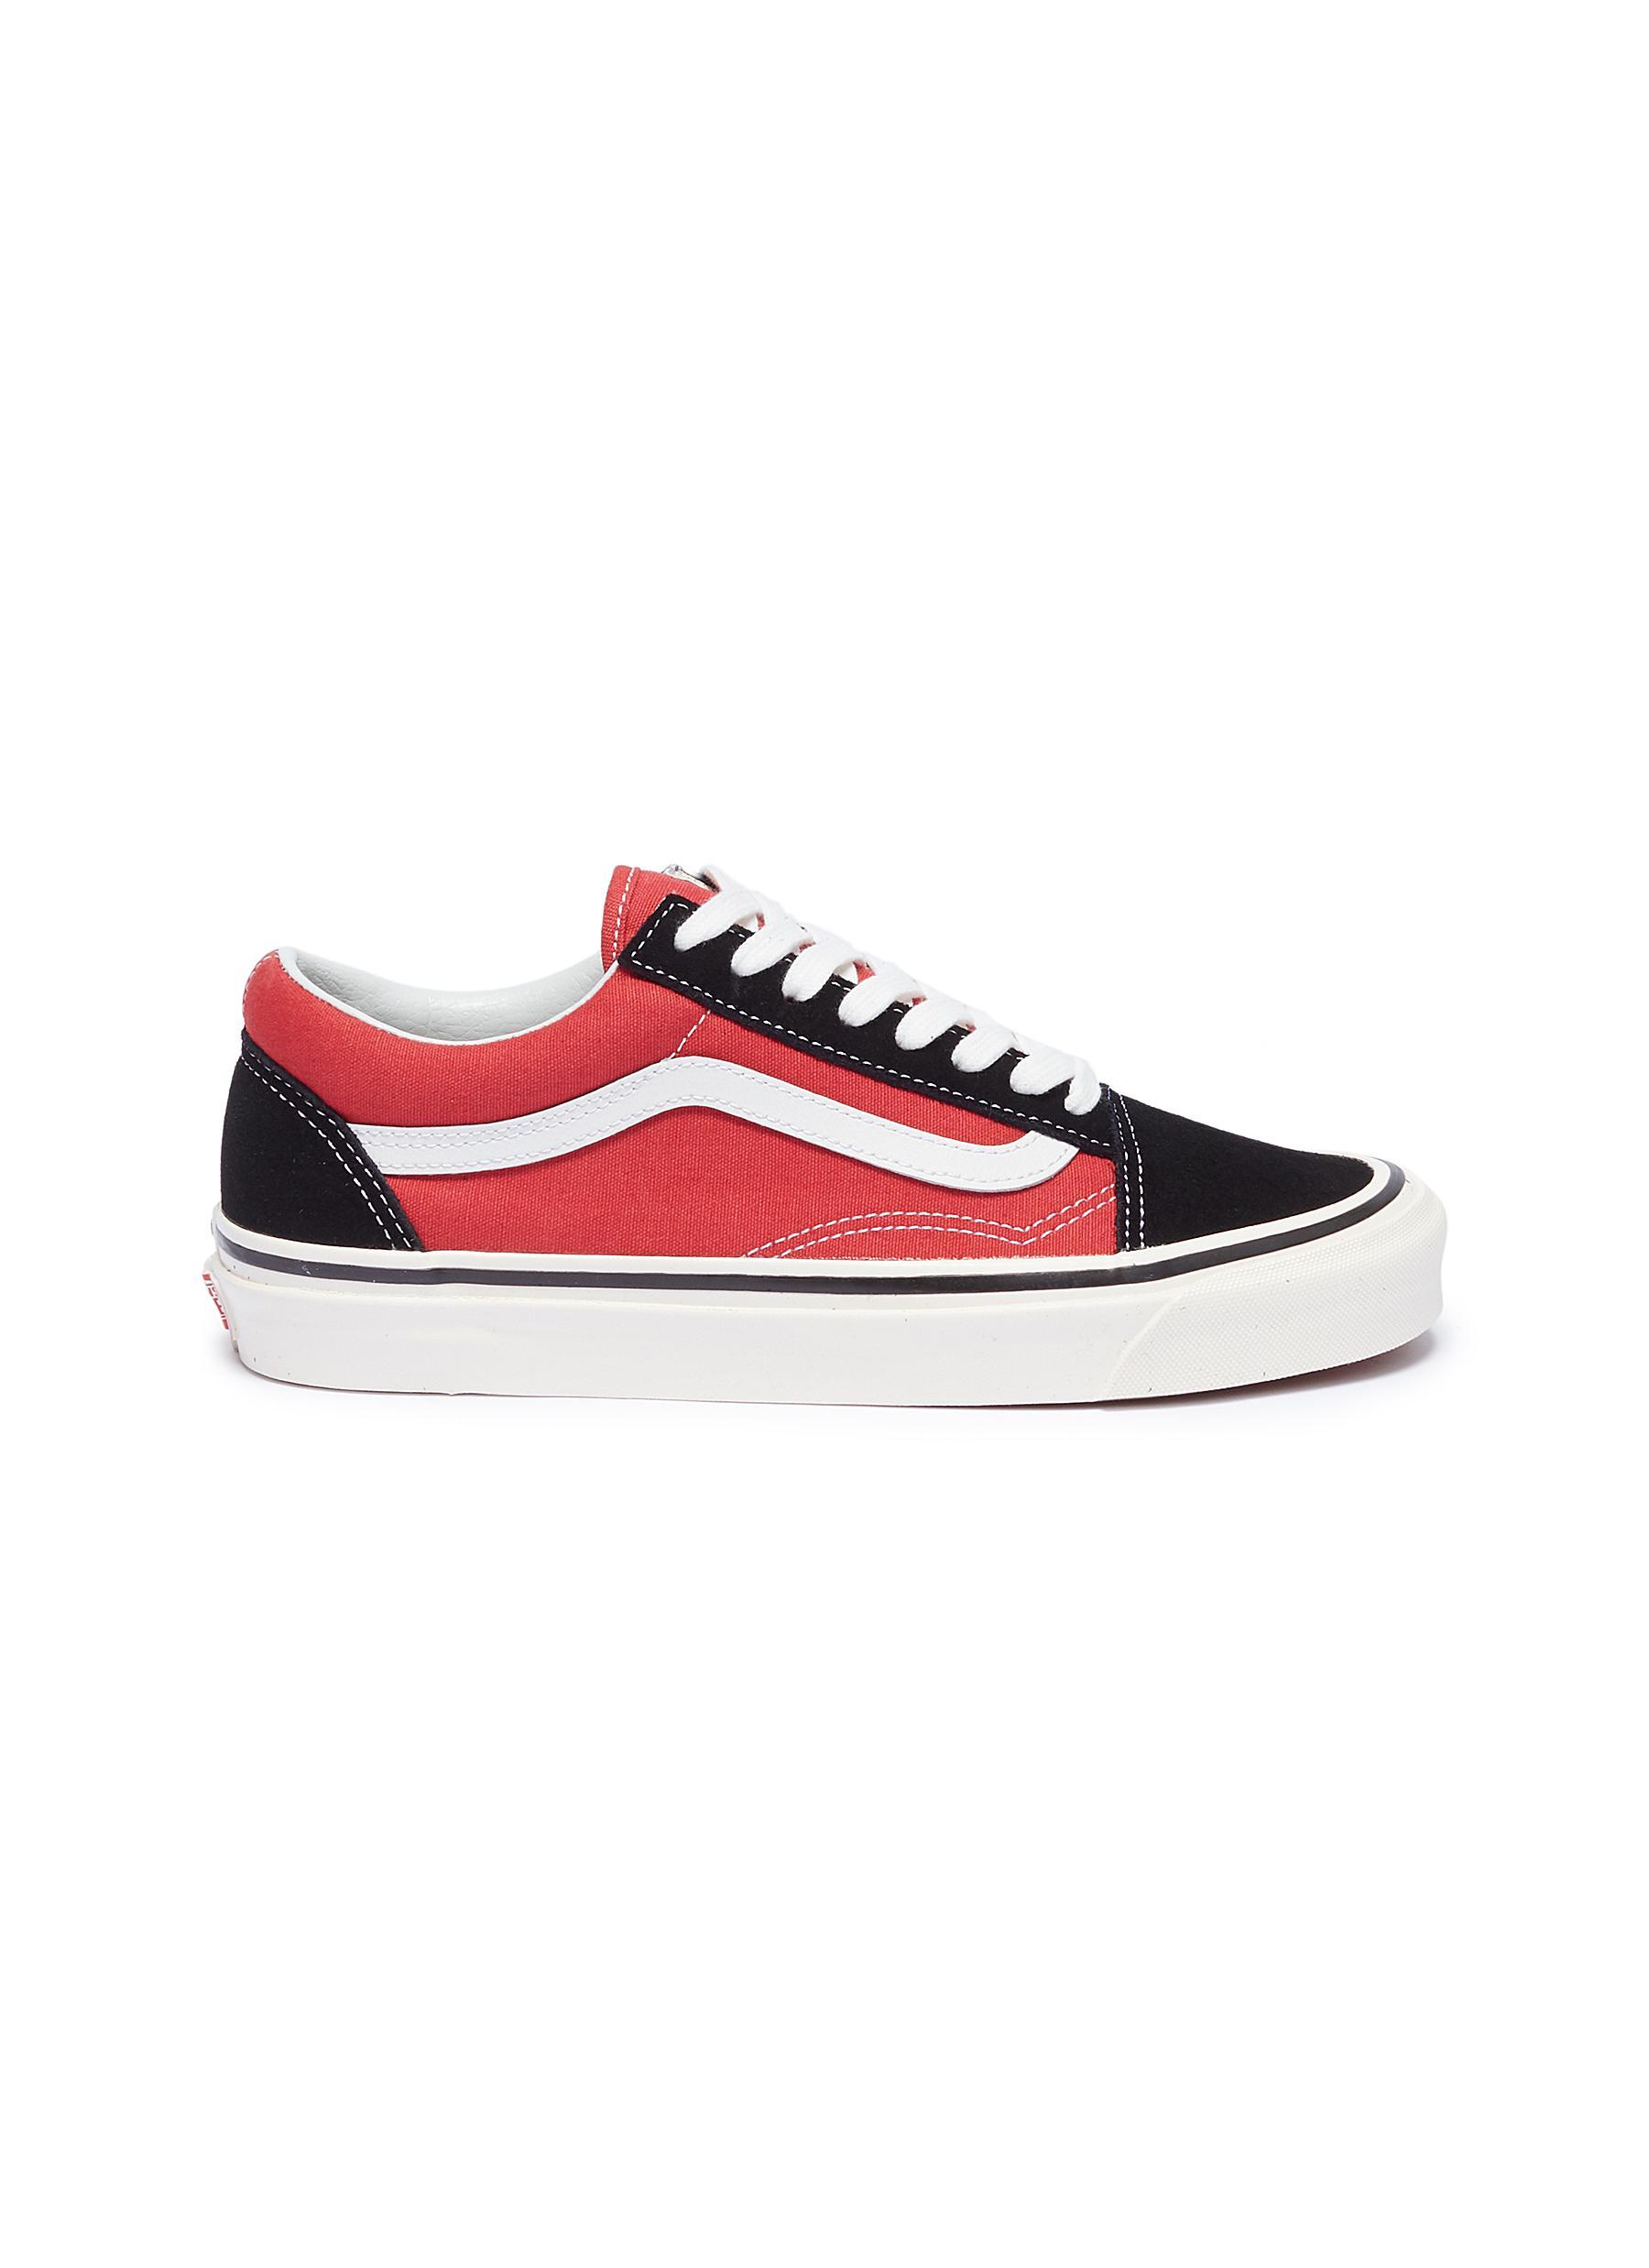 f71e696cff Vans.  Anaheim Factory Old Skool 36 DX  unisex canvas sneakers